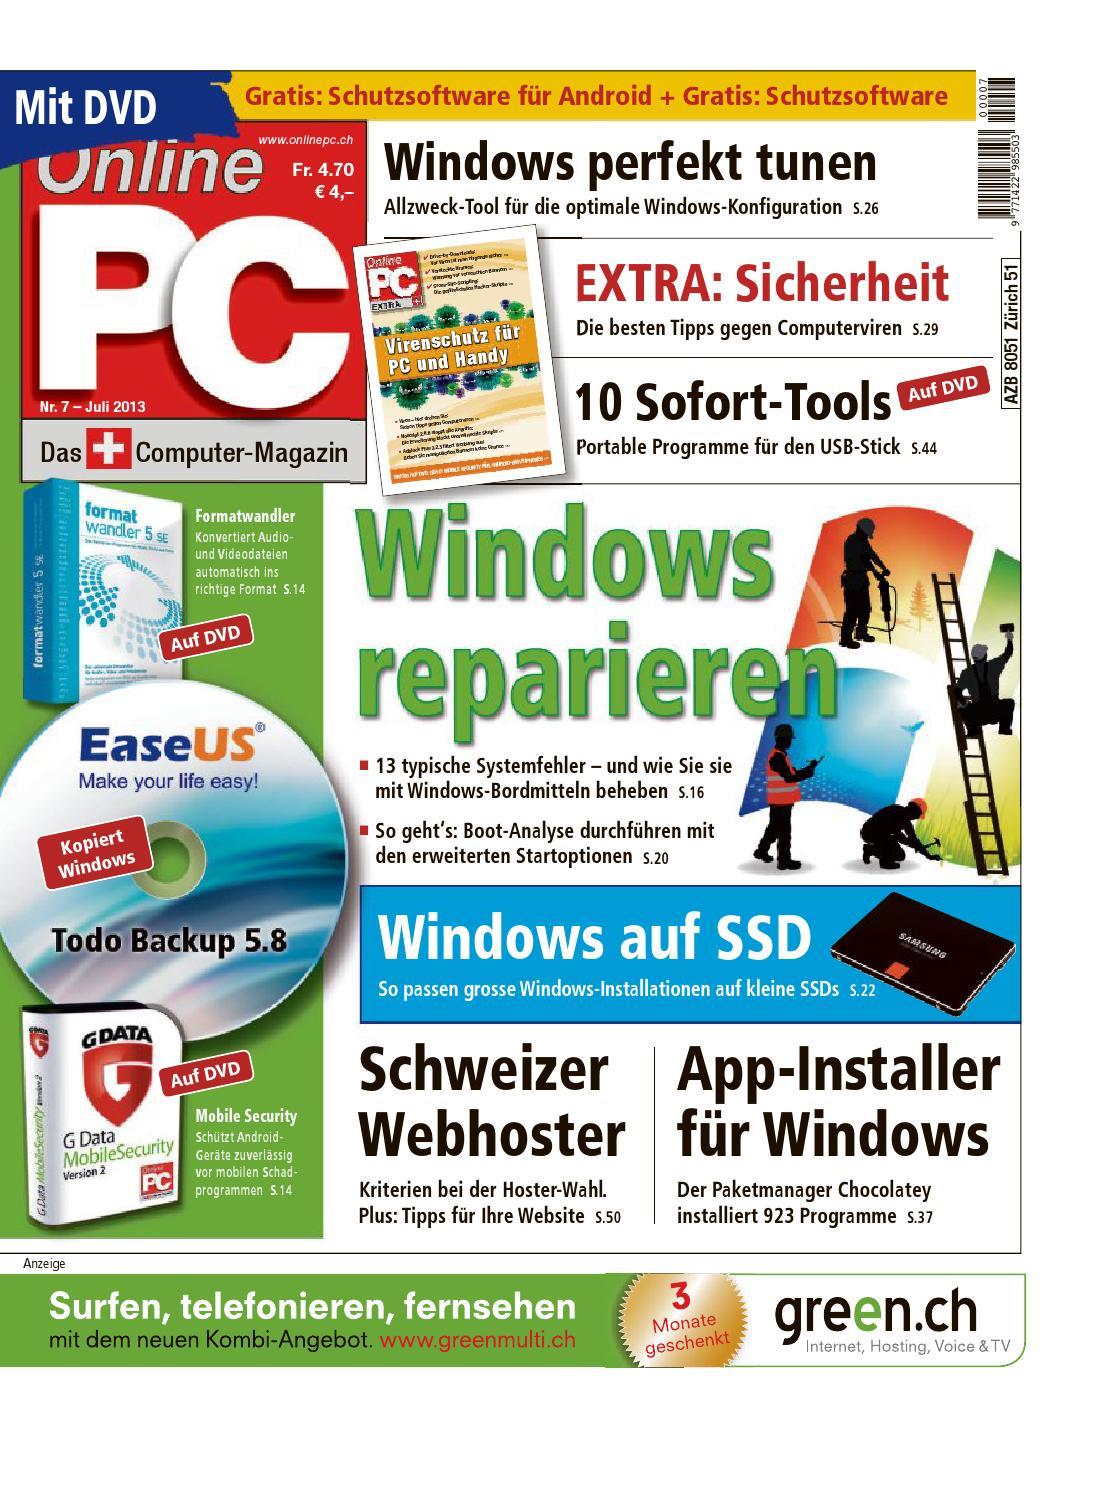 Online PC Magazin 07 2013 by Neue Mediengesellschaft Ulm - issuu